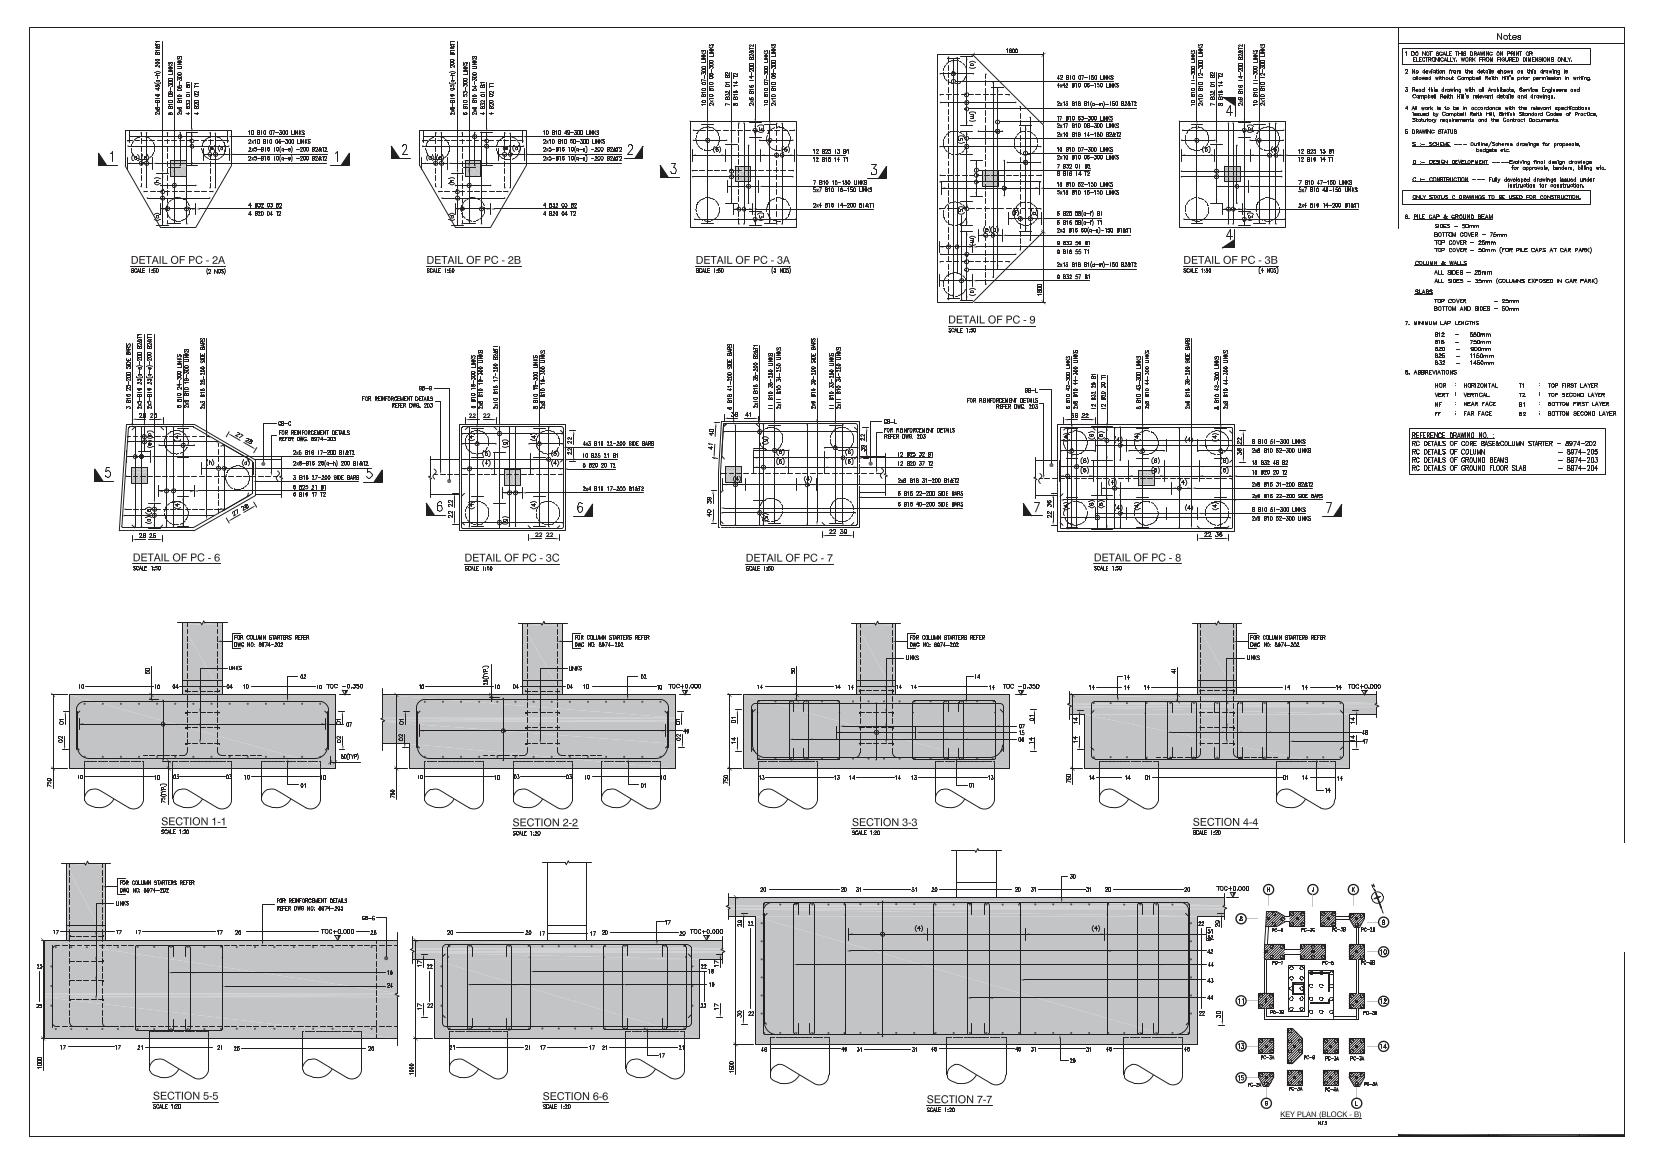 Cafe Floor Plan Cads Rc Sample Drawings Amp Bar Bending Schedules Cads Uk